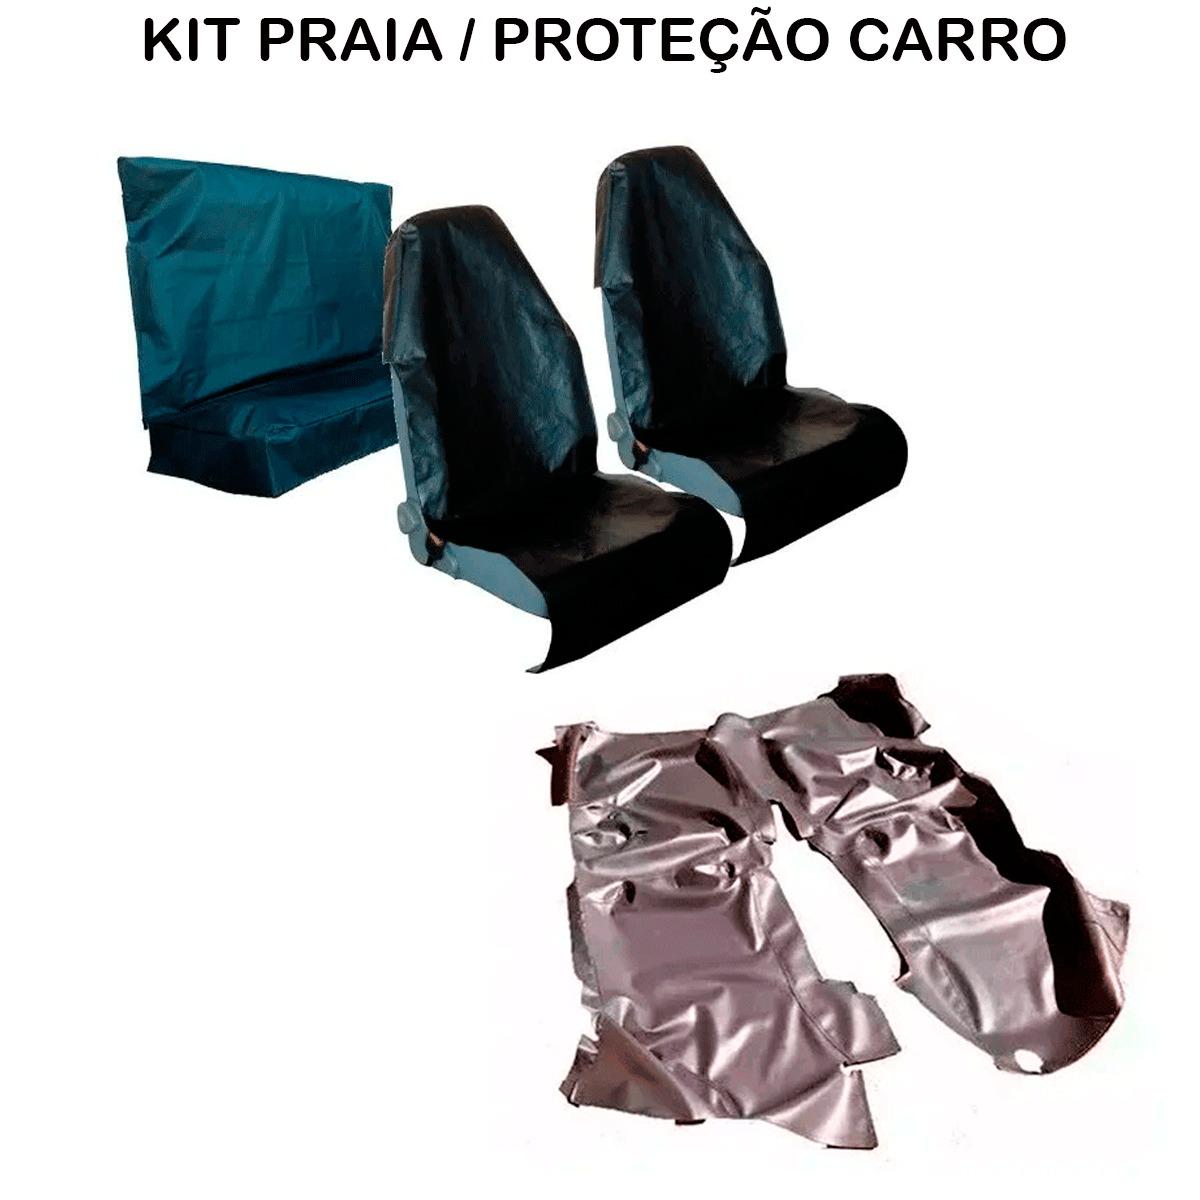 Tapete Em Vinil Fiat Siena 2003 a 2013 + Capa Banco Protecao Banco Areia Suor Academia